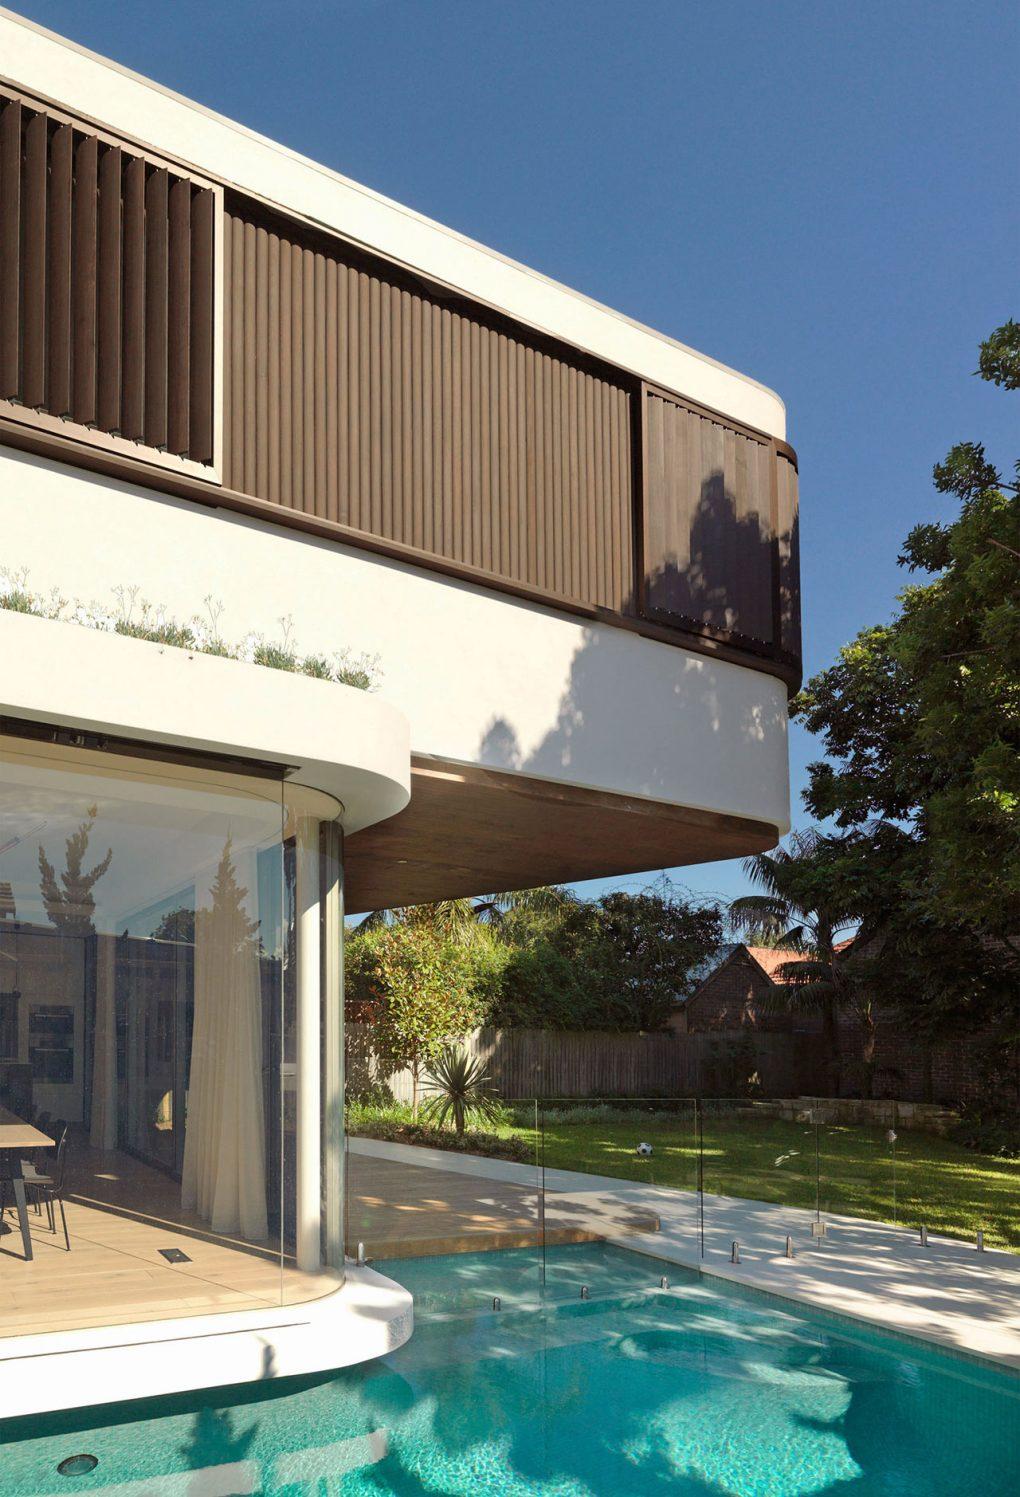 1910 Cottage Design Turns Into Modern Home Decor